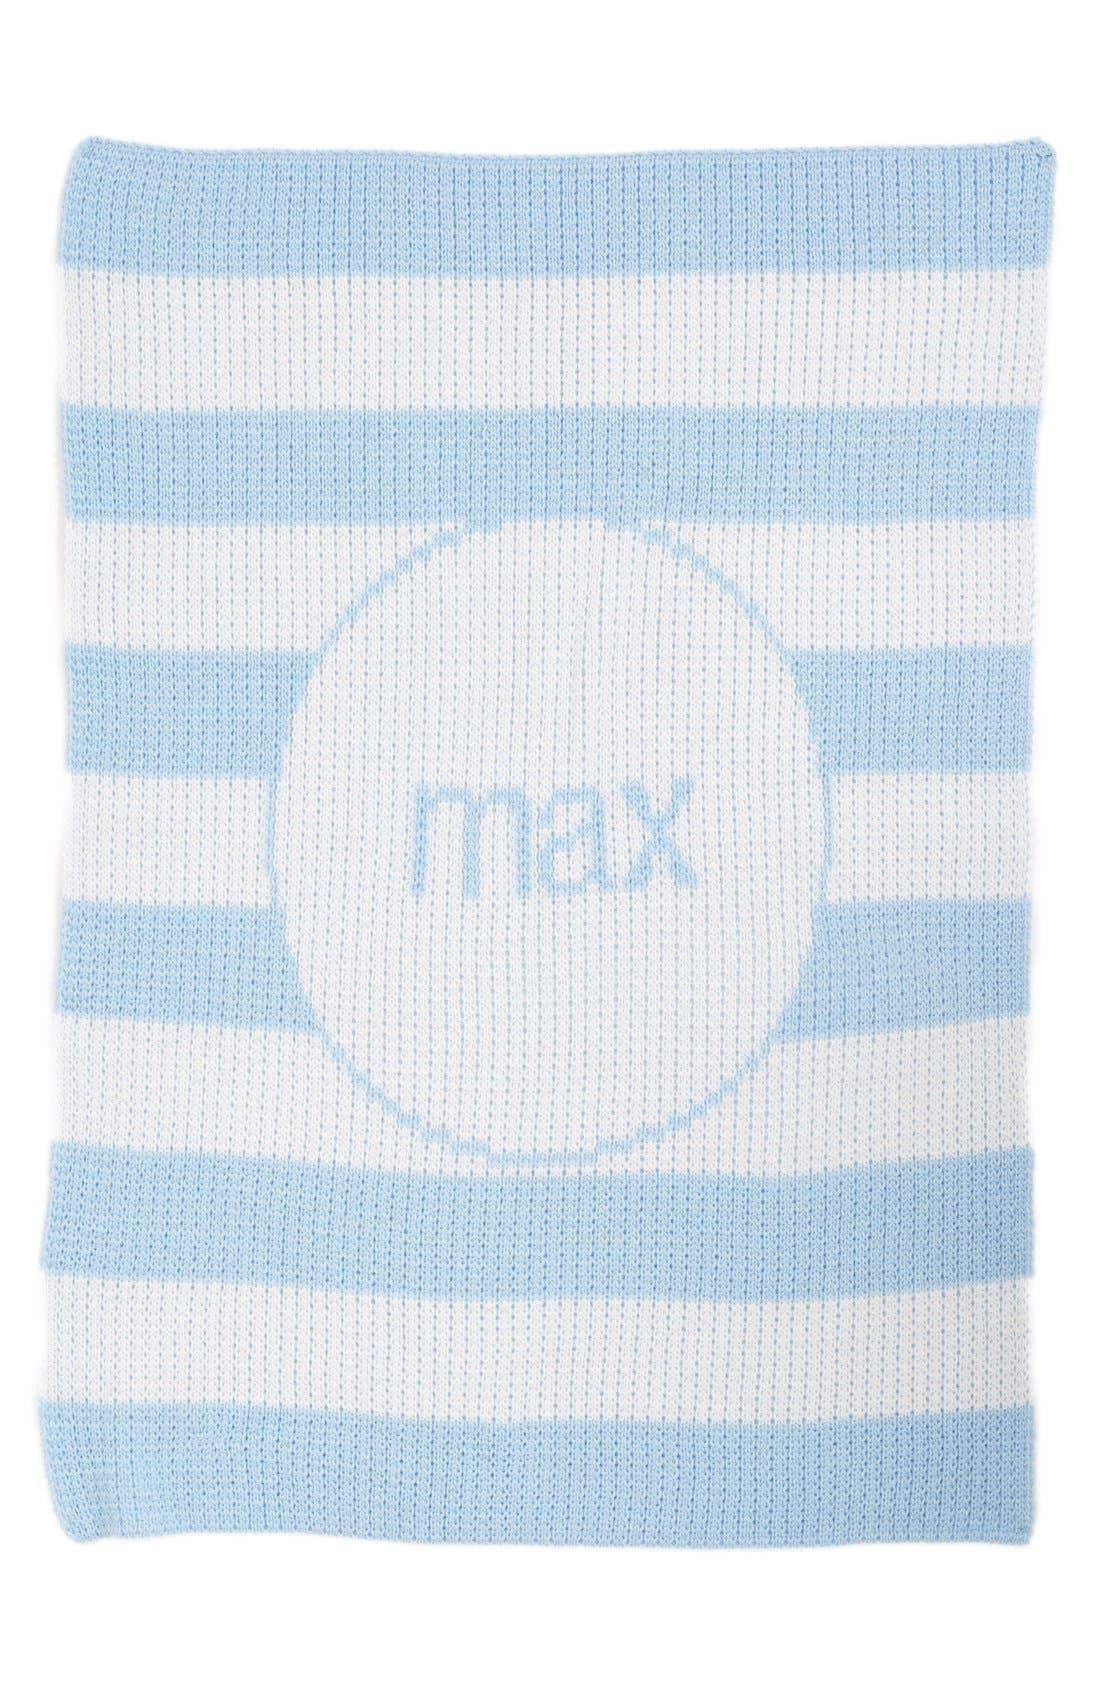 'Modern Stripe' Personalized Stroller Blanket,                             Main thumbnail 1, color,                             WHITE/ PALE BLUE